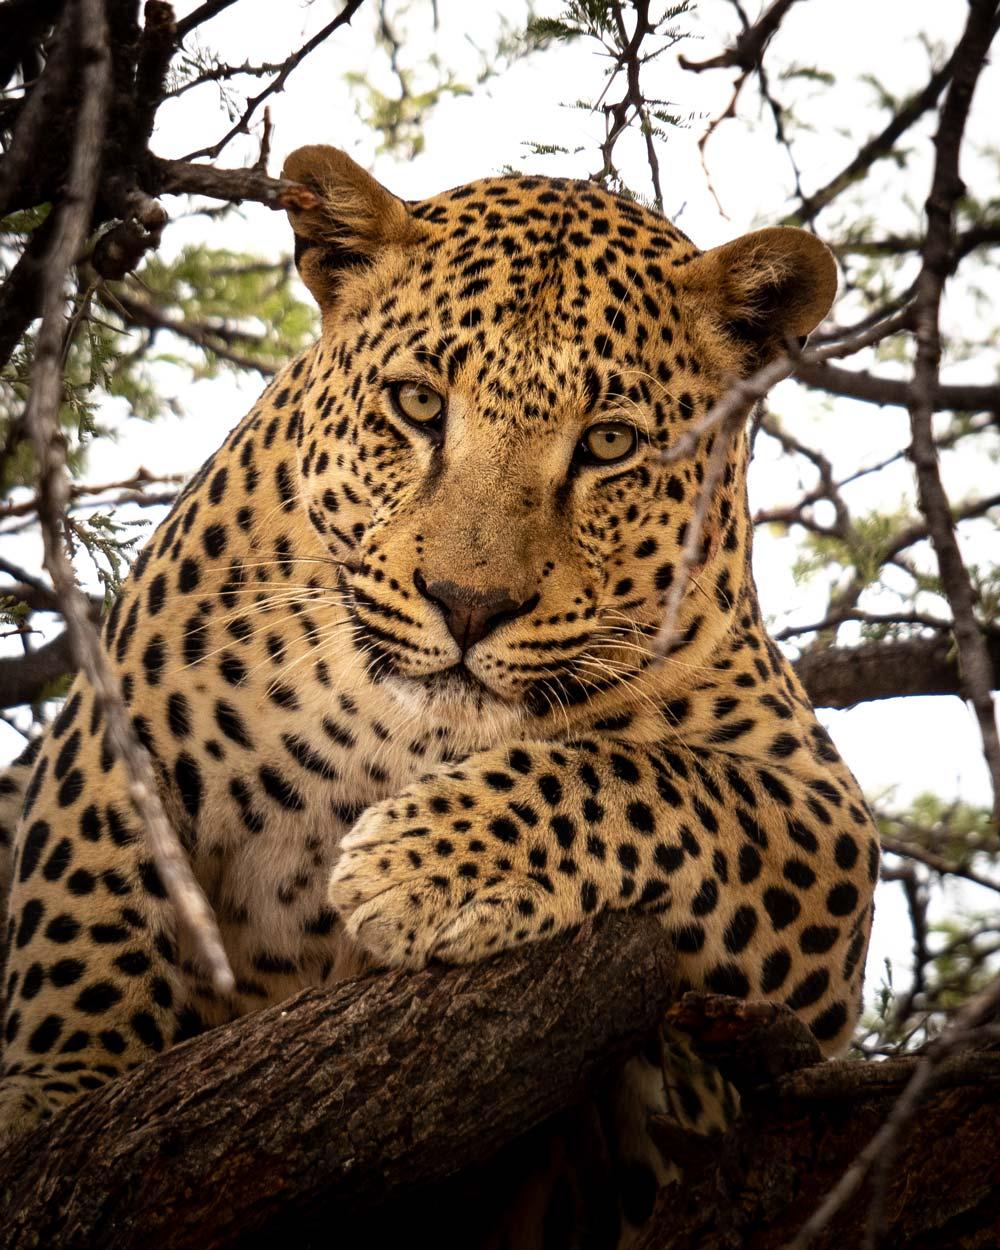 leopard-namibia-botswana-safari-frank.jpg